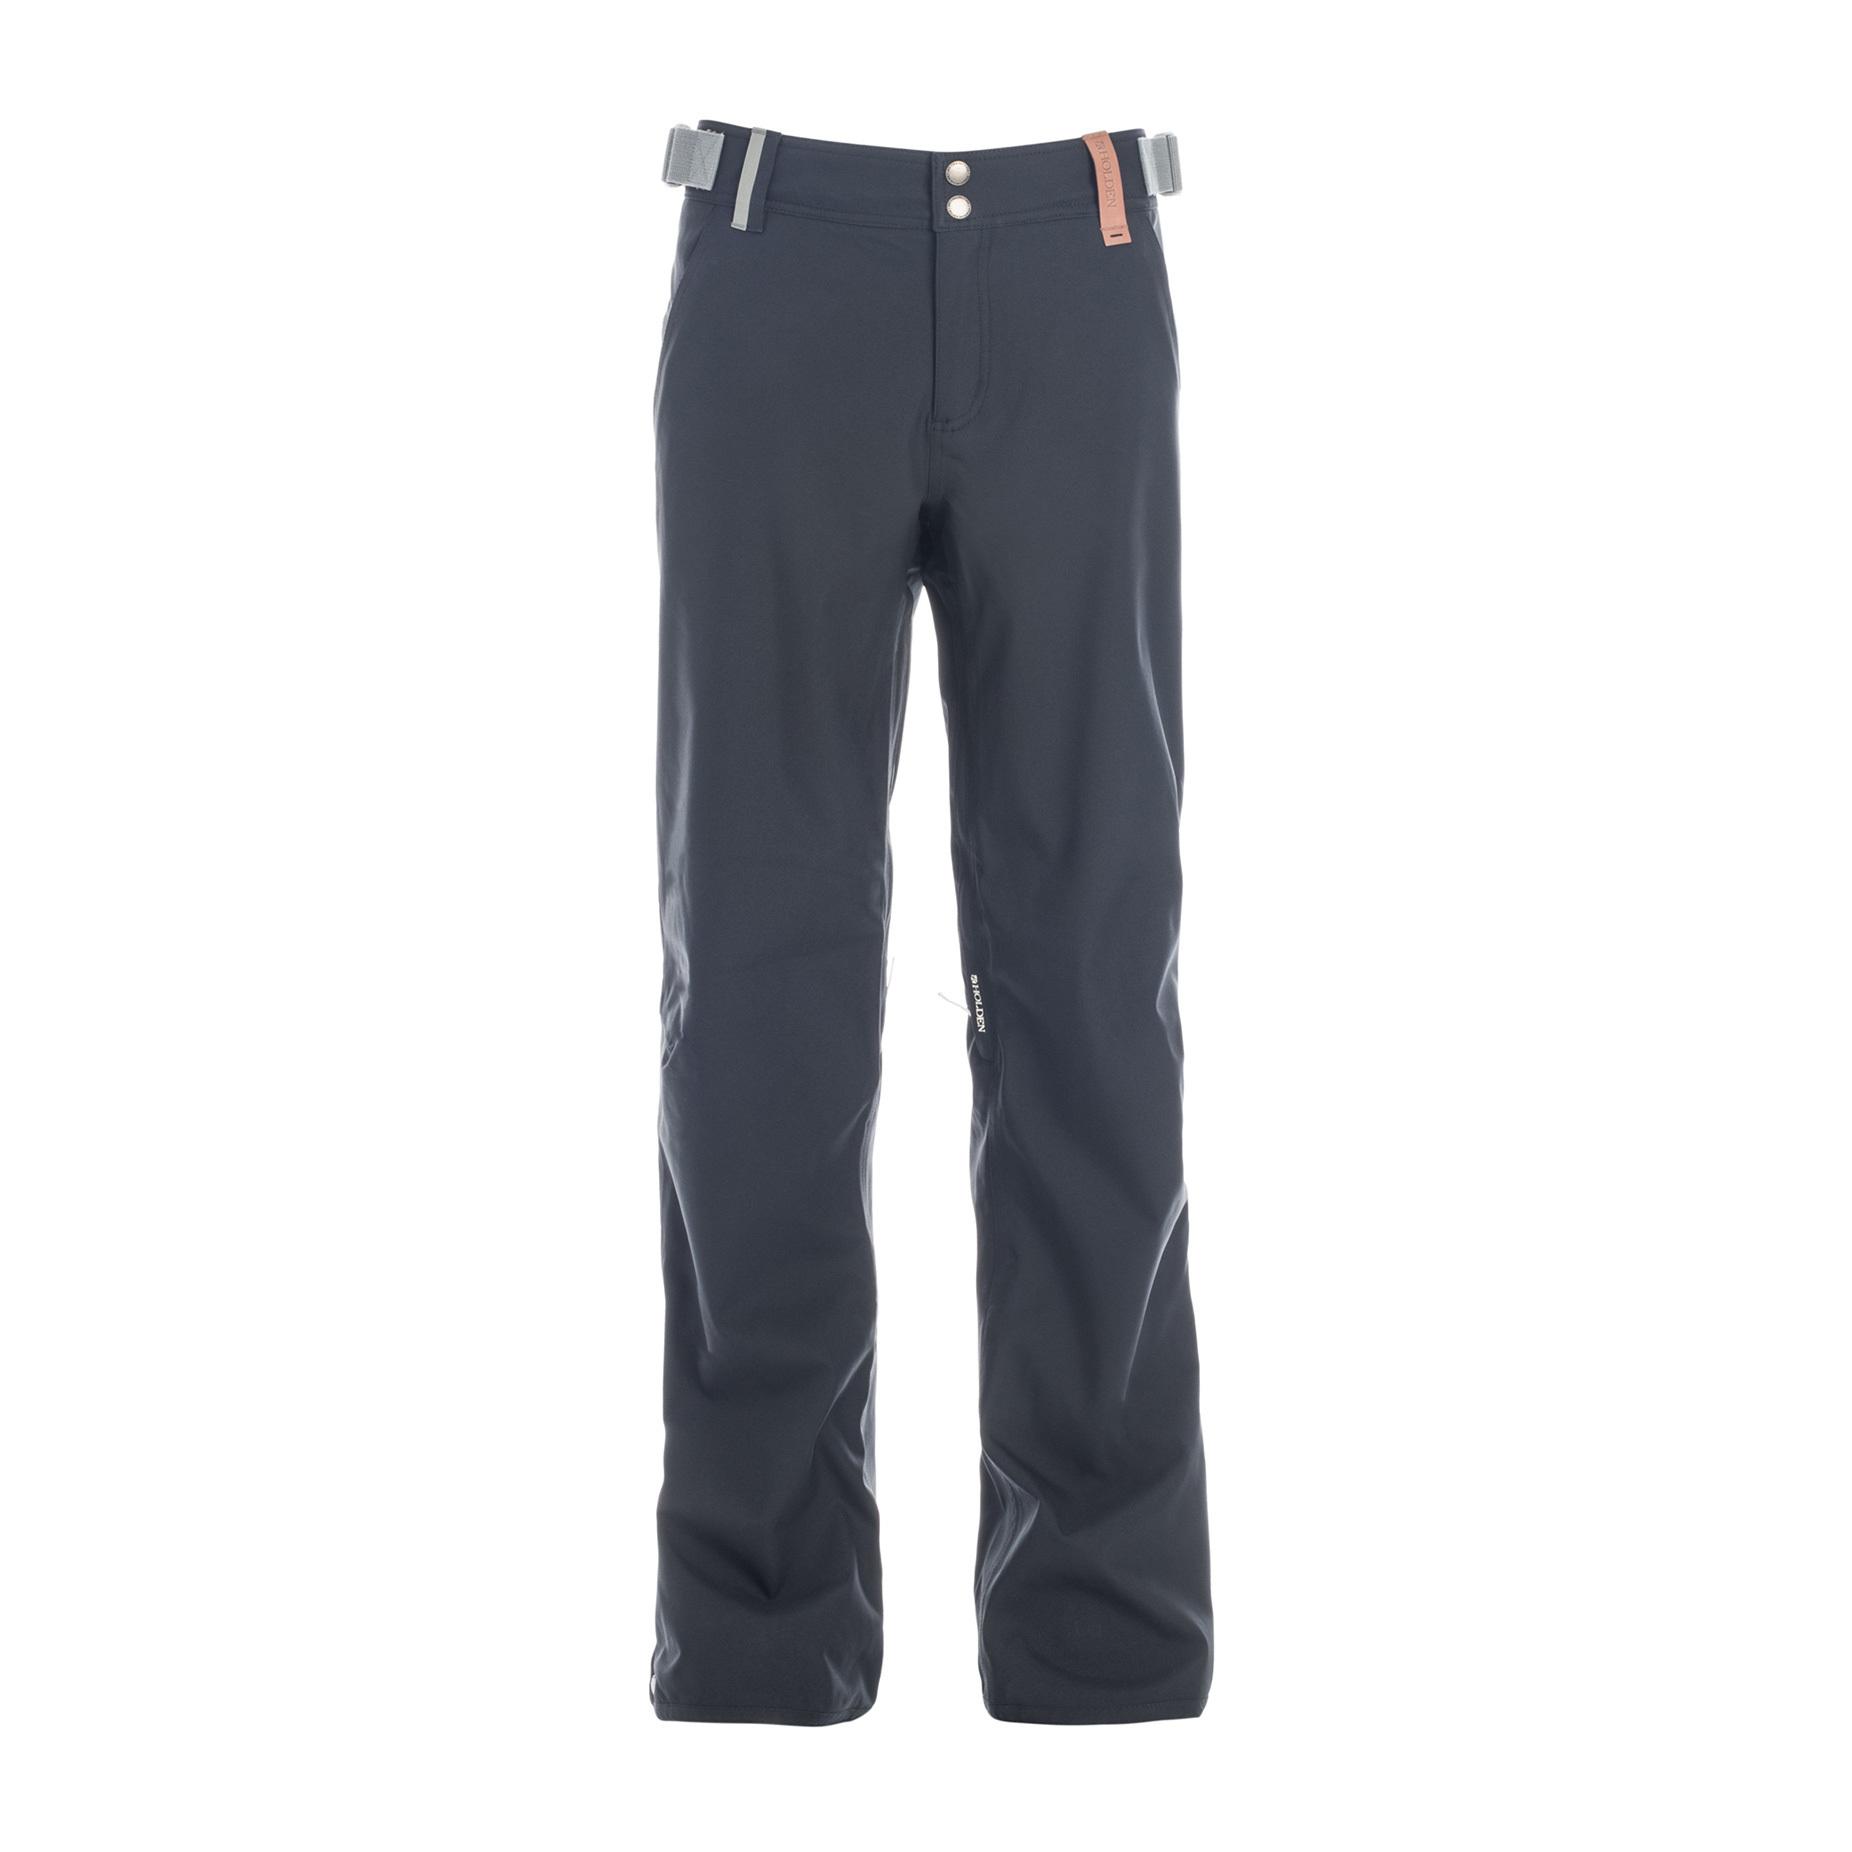 Holden Men's Standard Skinny Pant Moosejaw